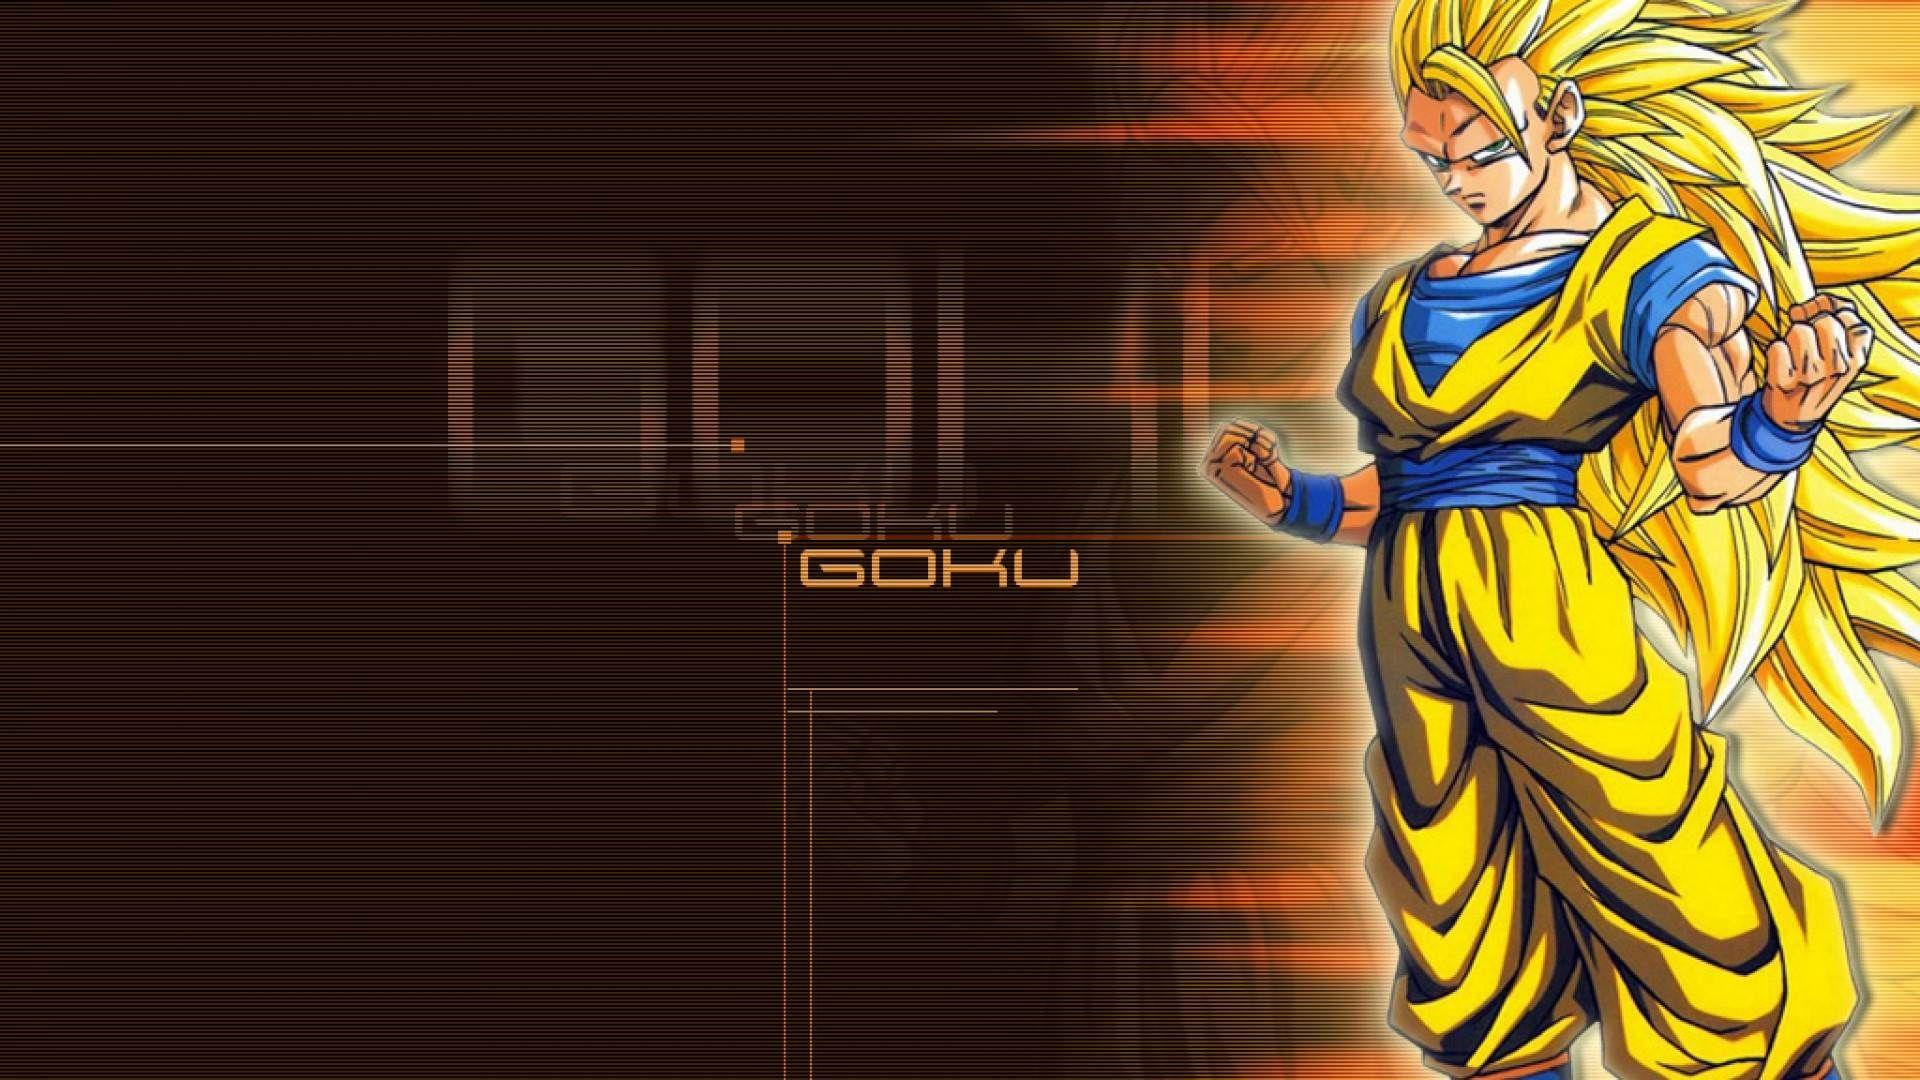 Dragon Ball Z Wallpapers Goku Wallpaper 19201080 Goku Super Saiyan